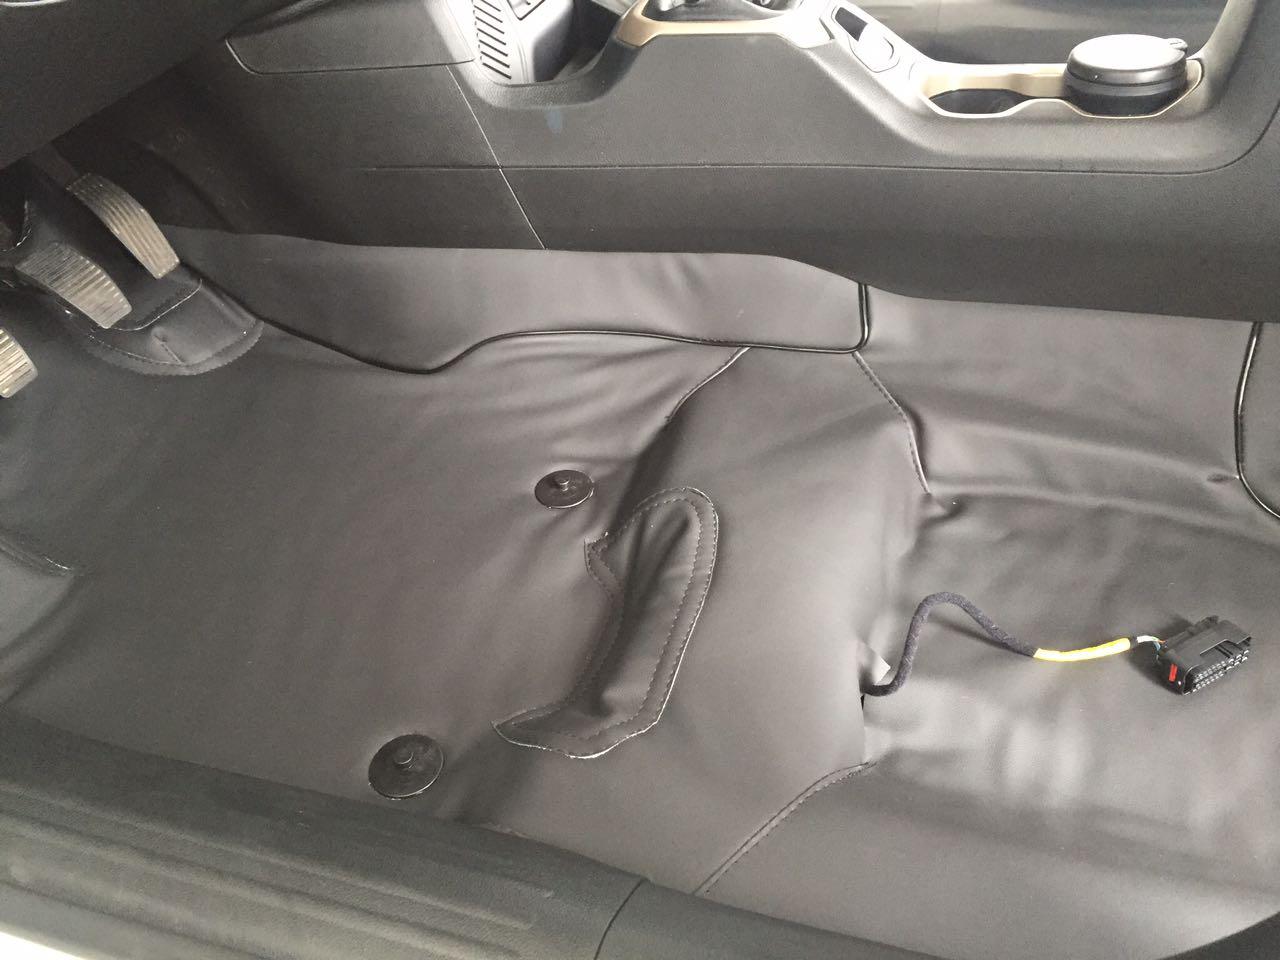 Forro Super Luxo Automotivo Assoalho Para Xterra 2000 a 2008